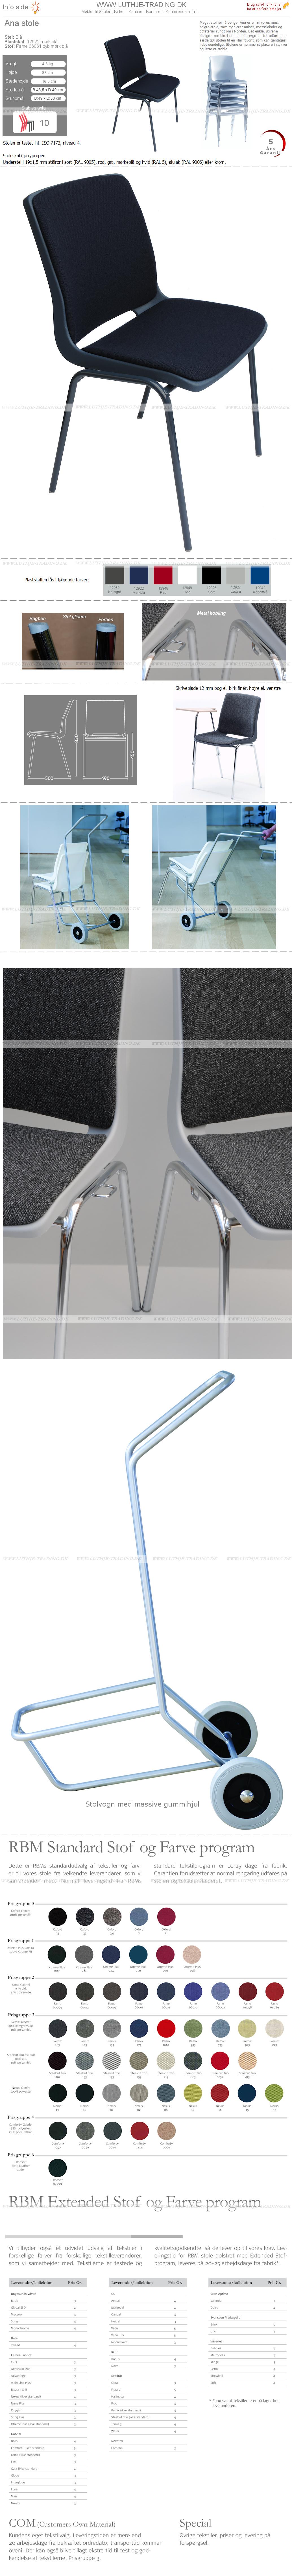 Ana stol med mørkblå stel, mørkblå plastskal og Fame stof 66061 blå. Der er 5 års garanti på Ana stole.